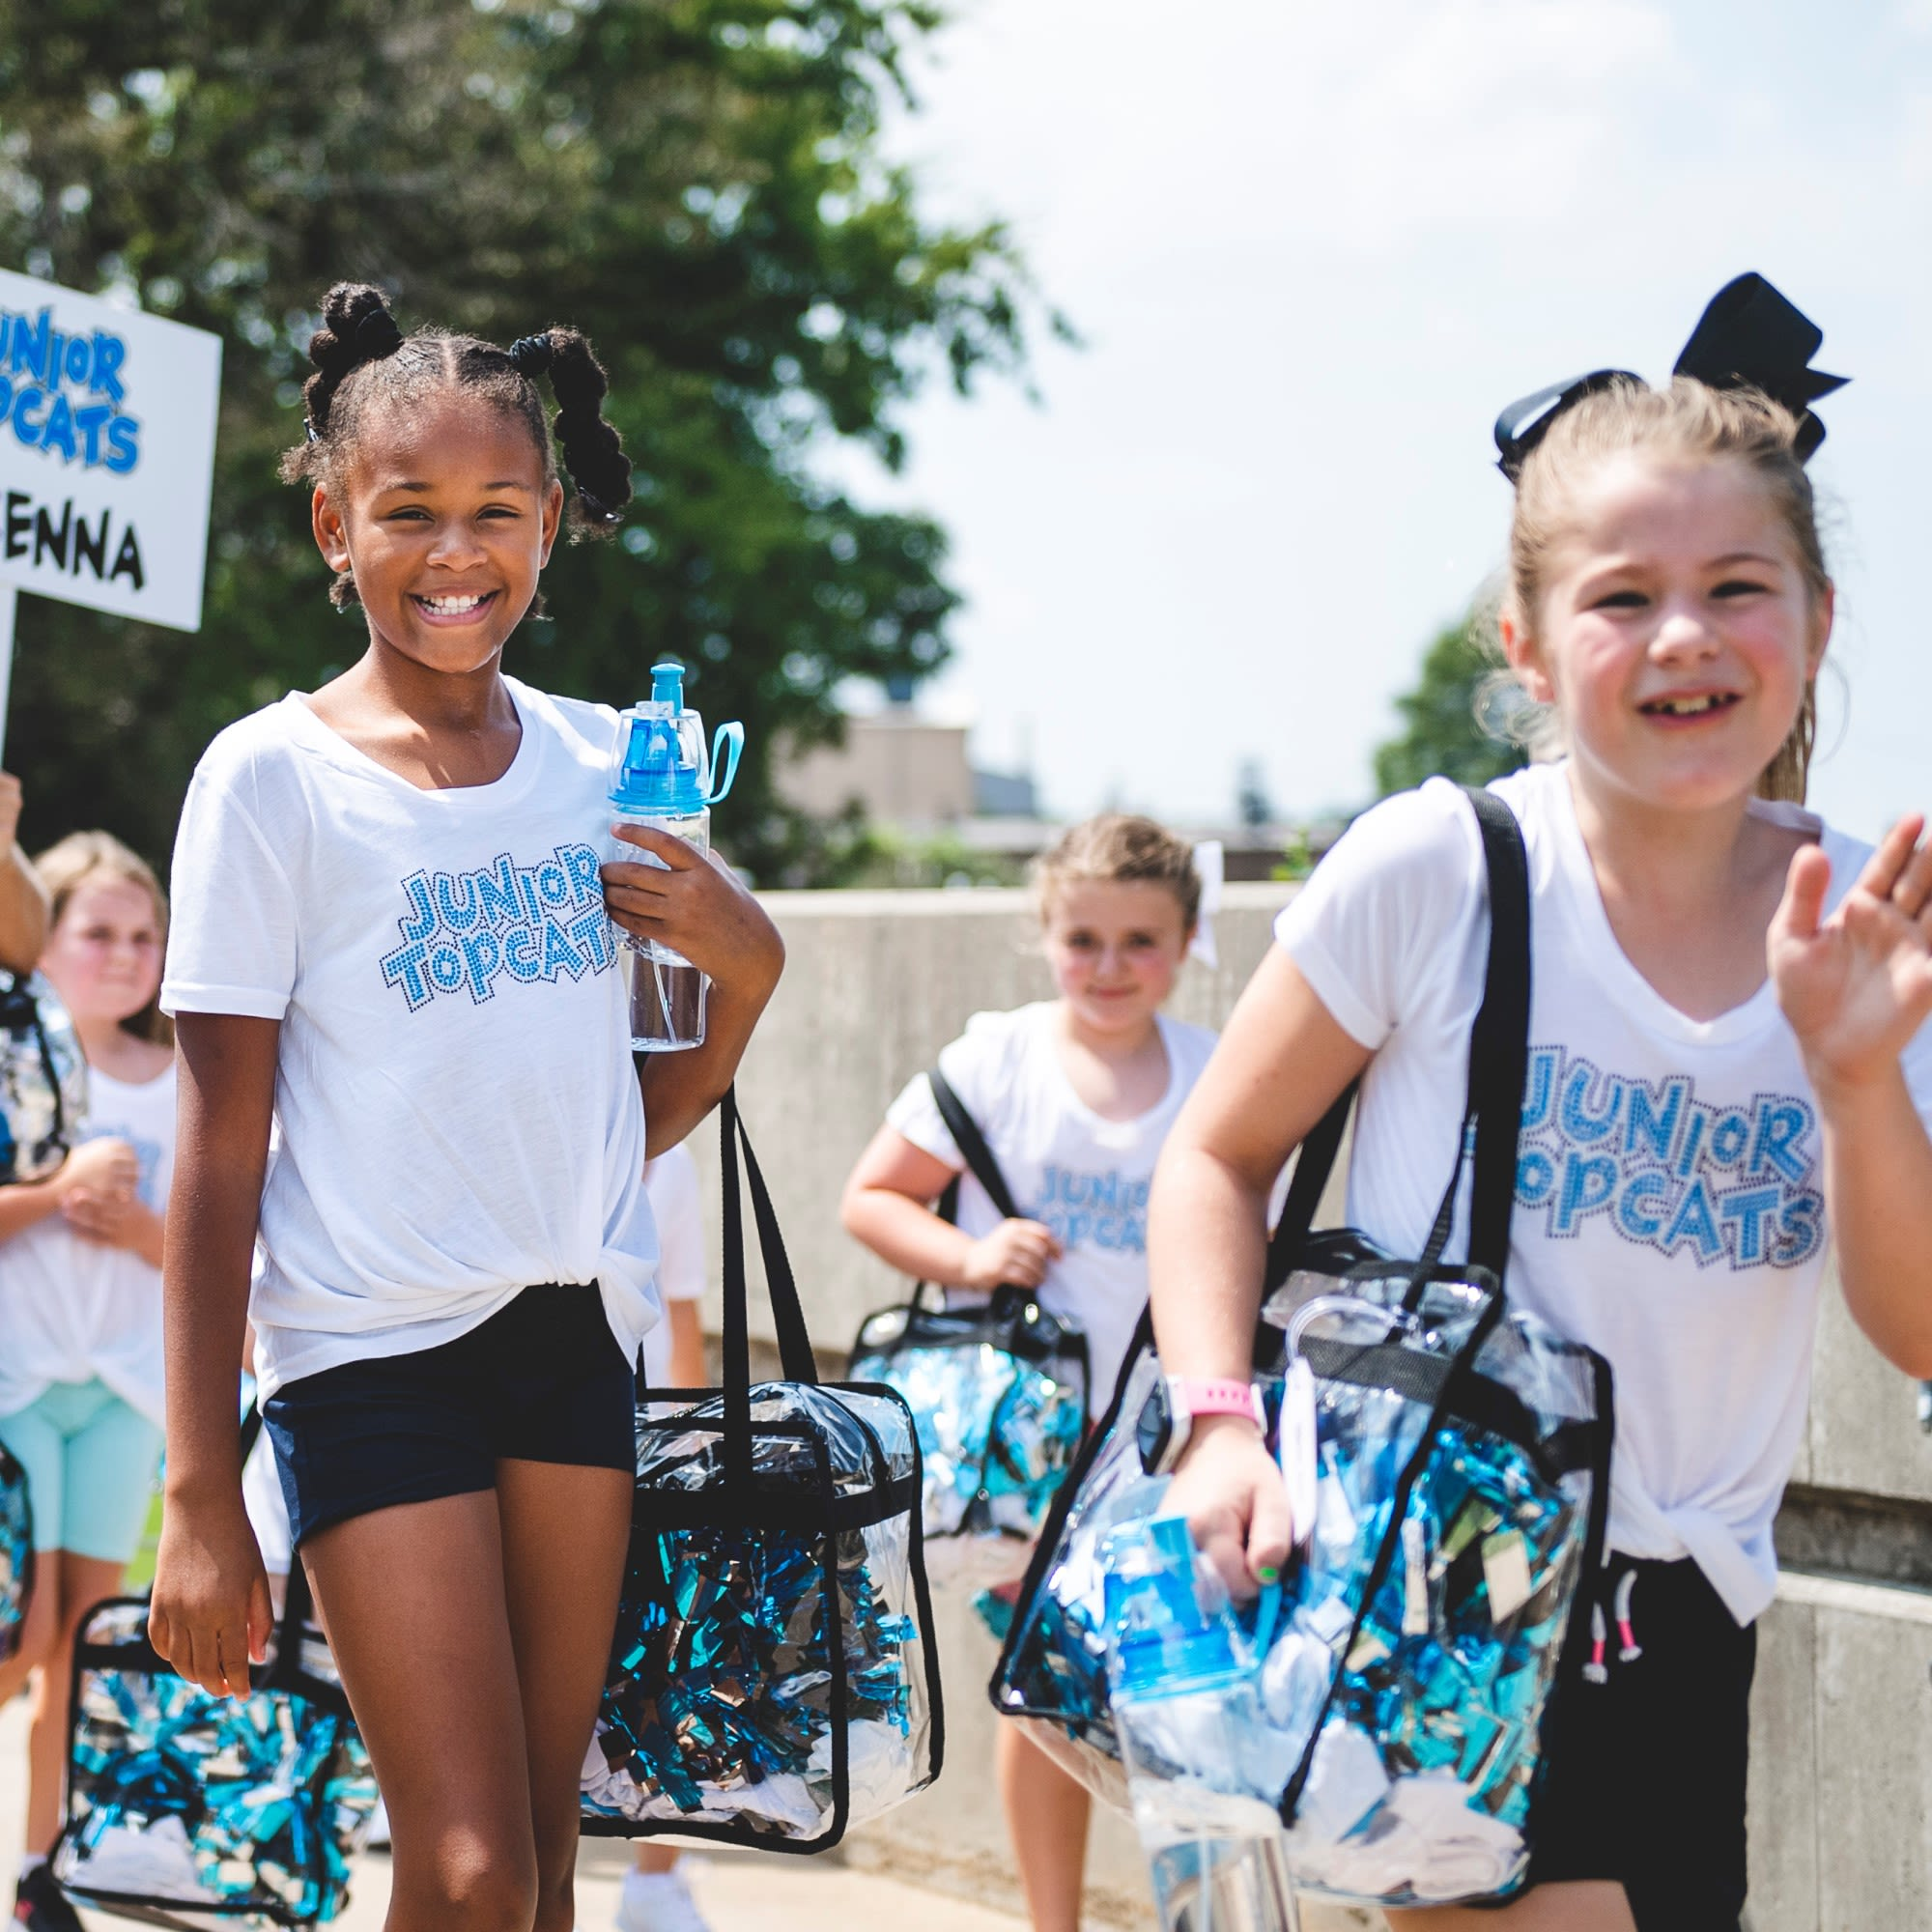 Junior TopCats Summer Camp